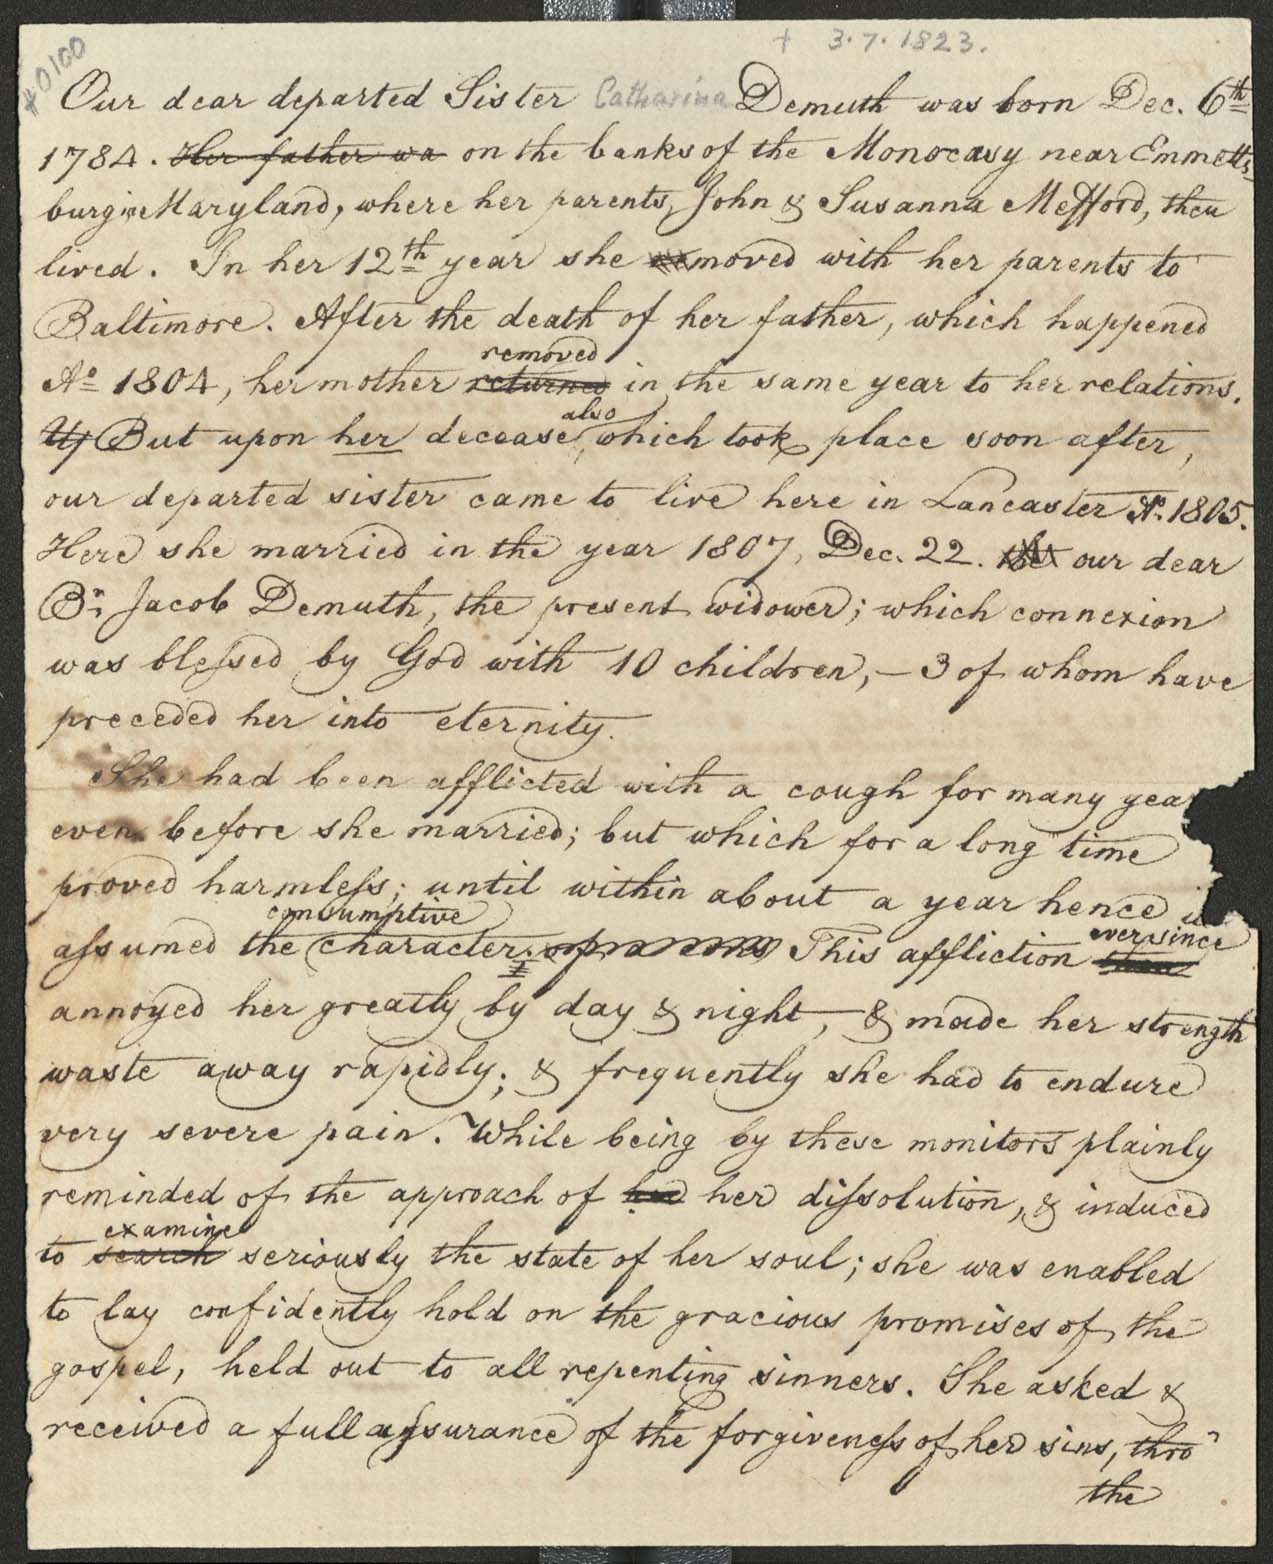 Memior of Catharine Demuth (1784-1823) pg 1